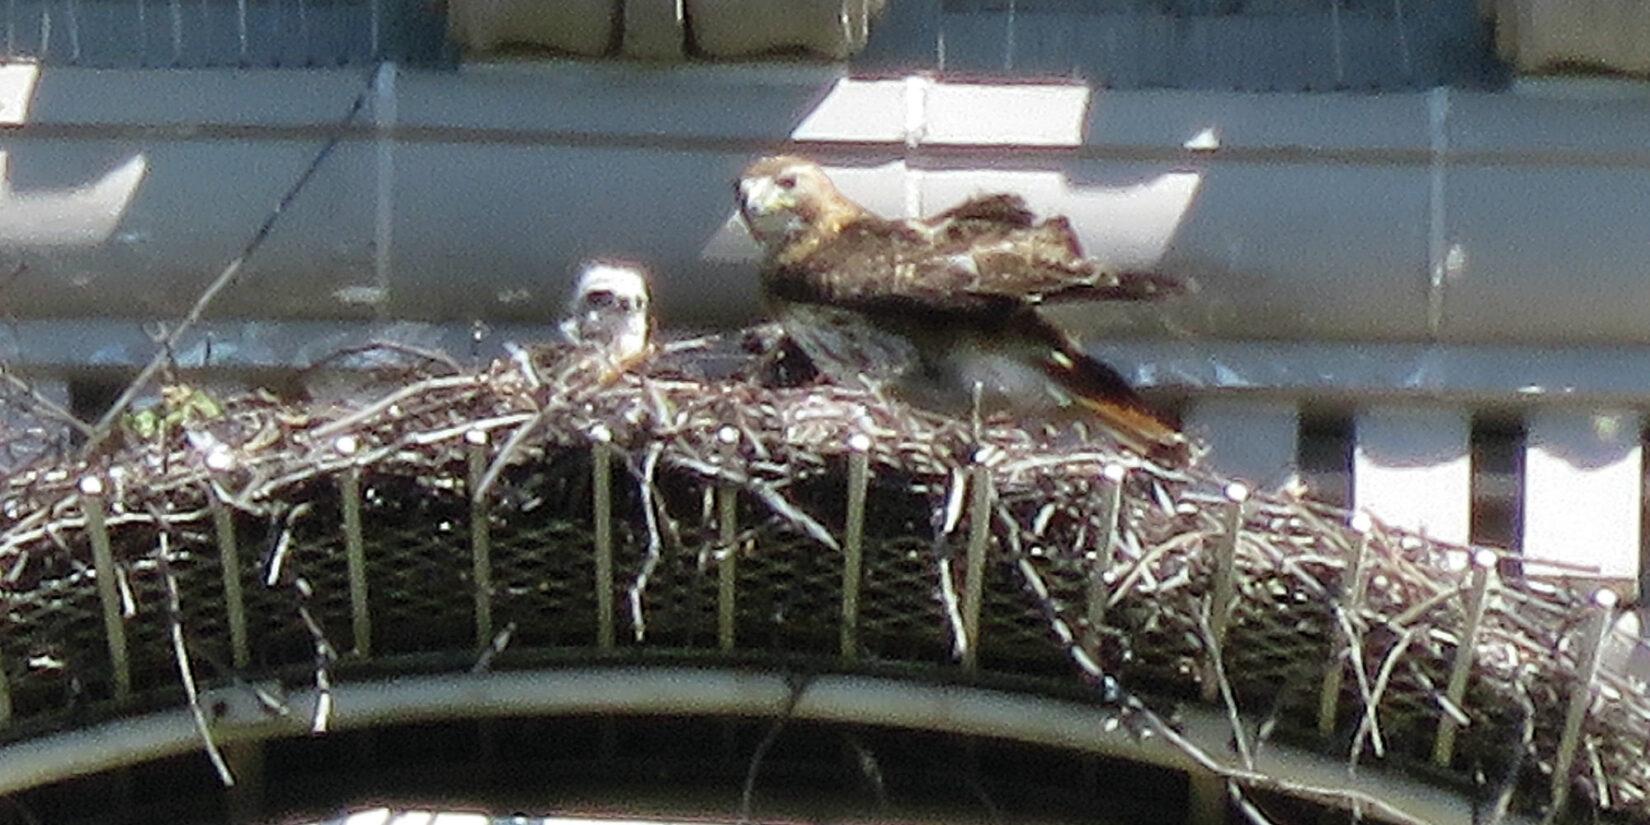 The bird's nest photographed through a powerful telephoto lens.